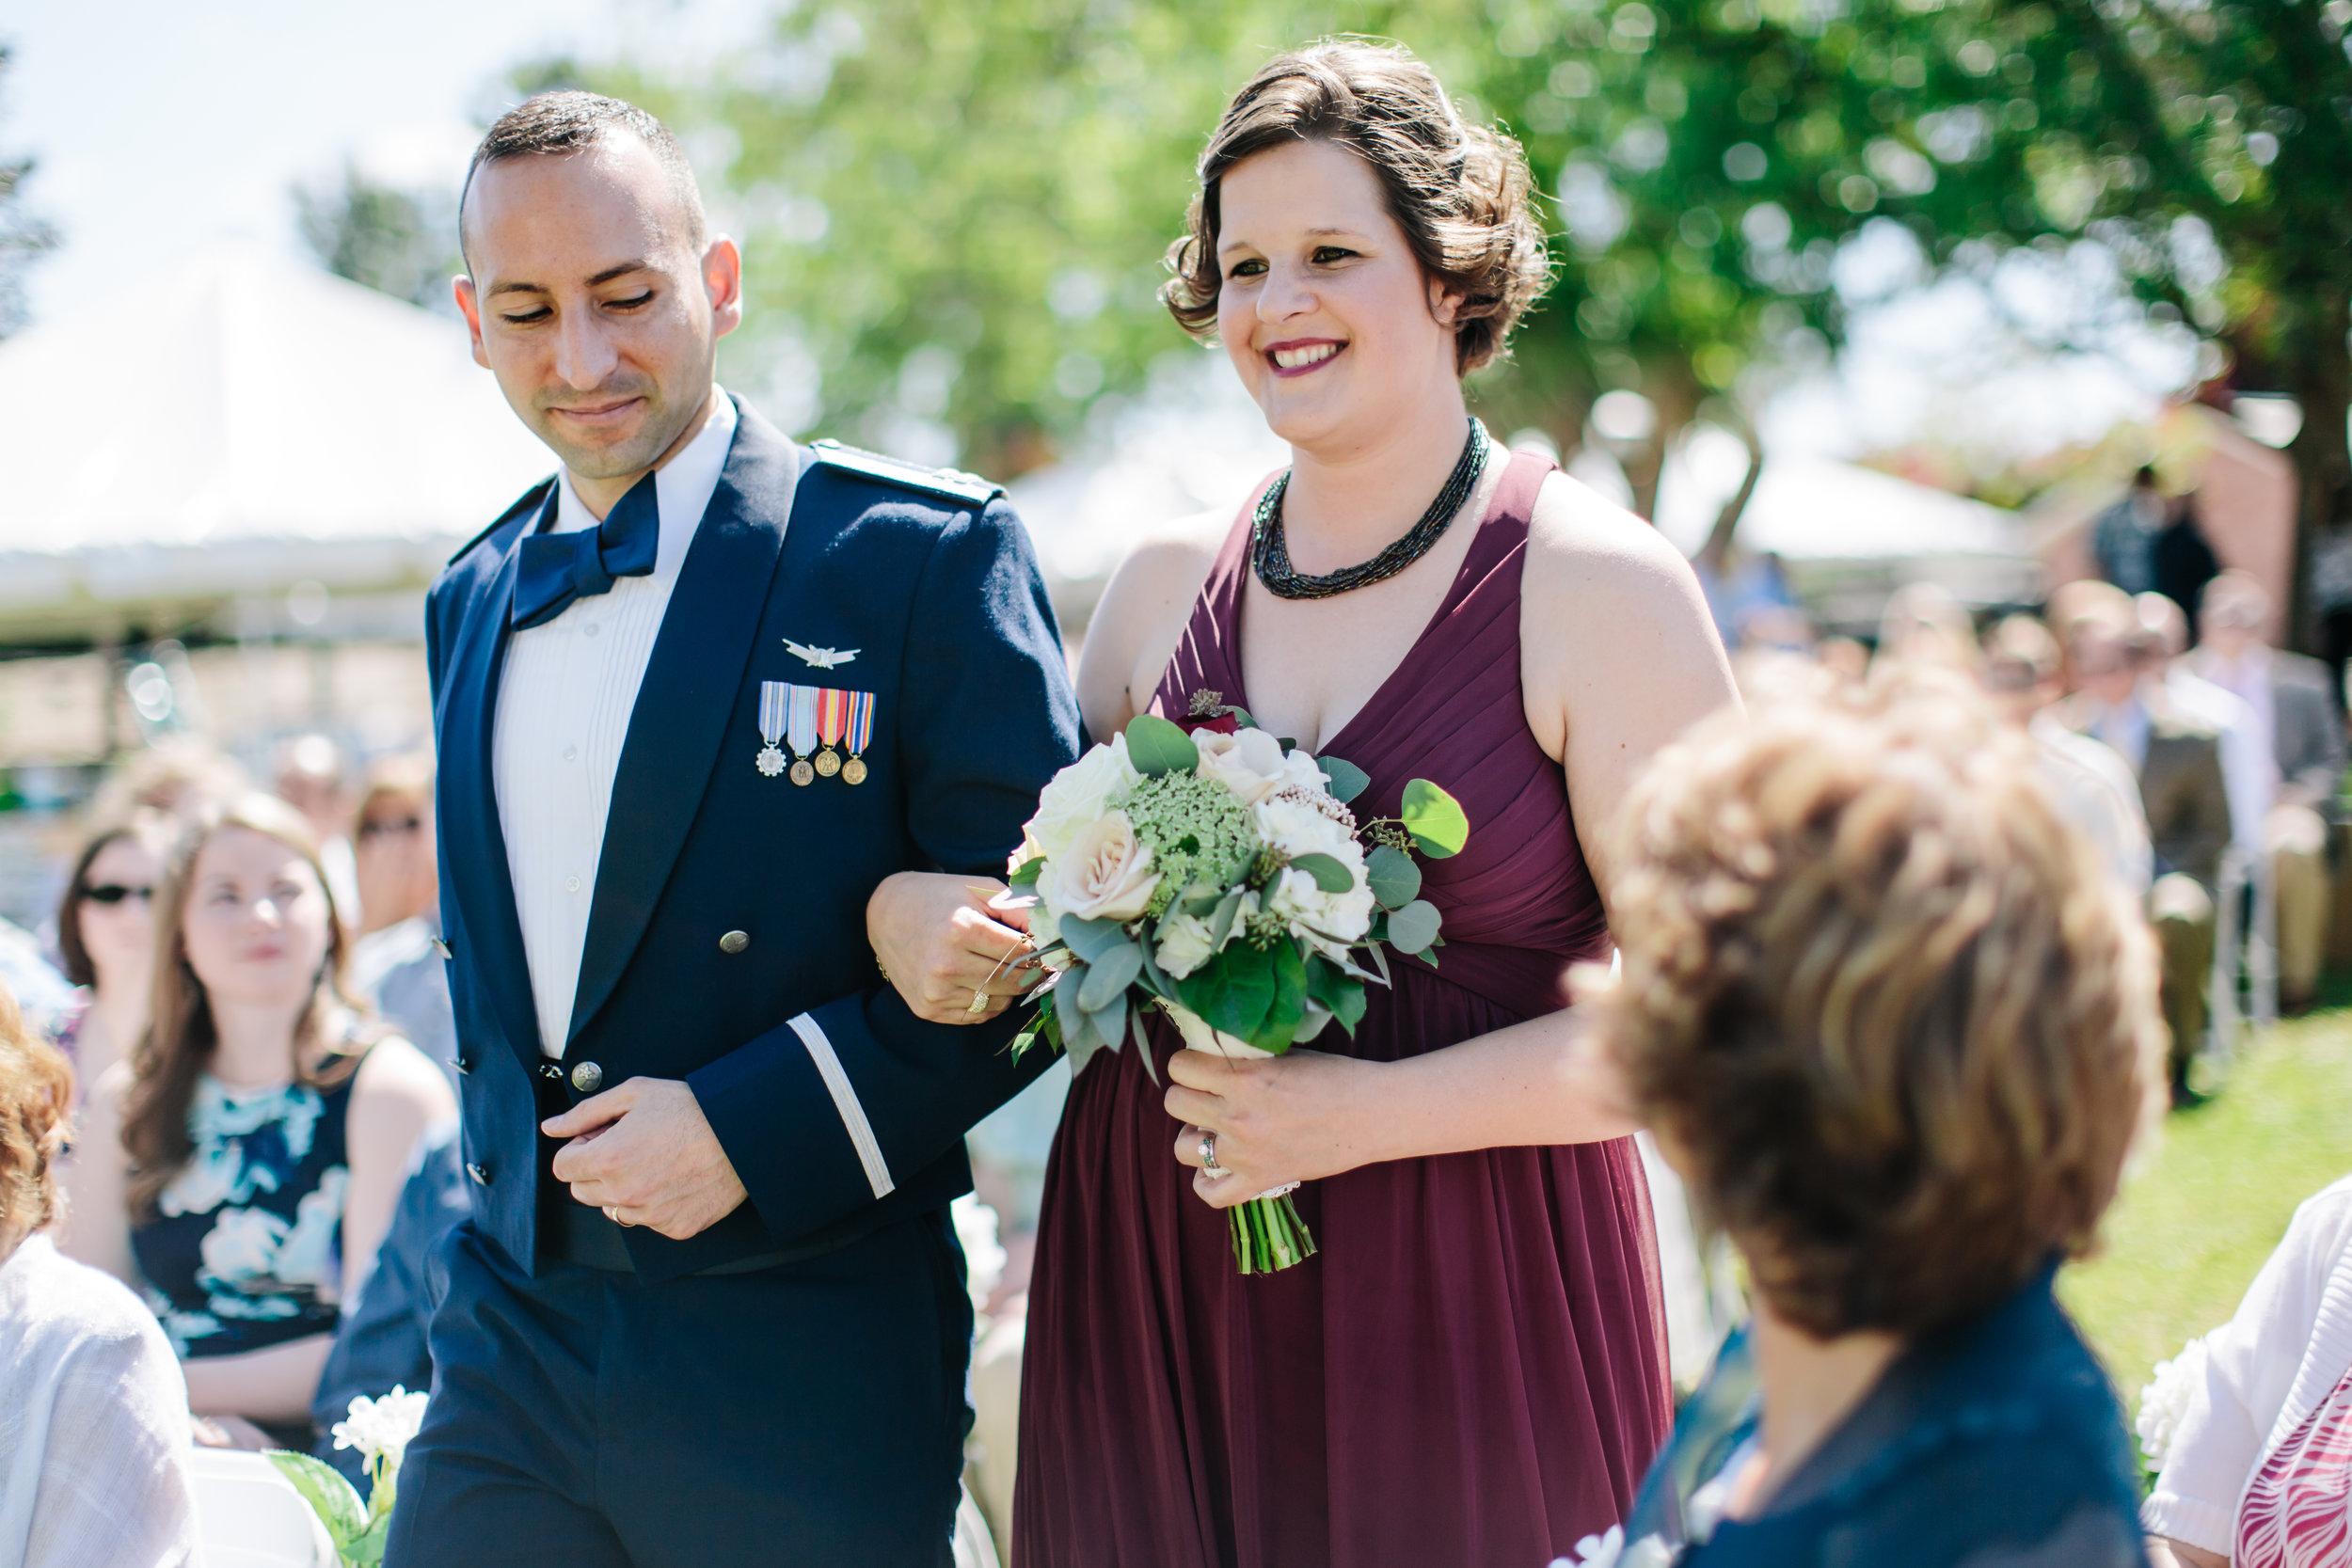 2018.03.17 Allison and Chuck Wedding Waelti Melbourne (225 of 900).jpg